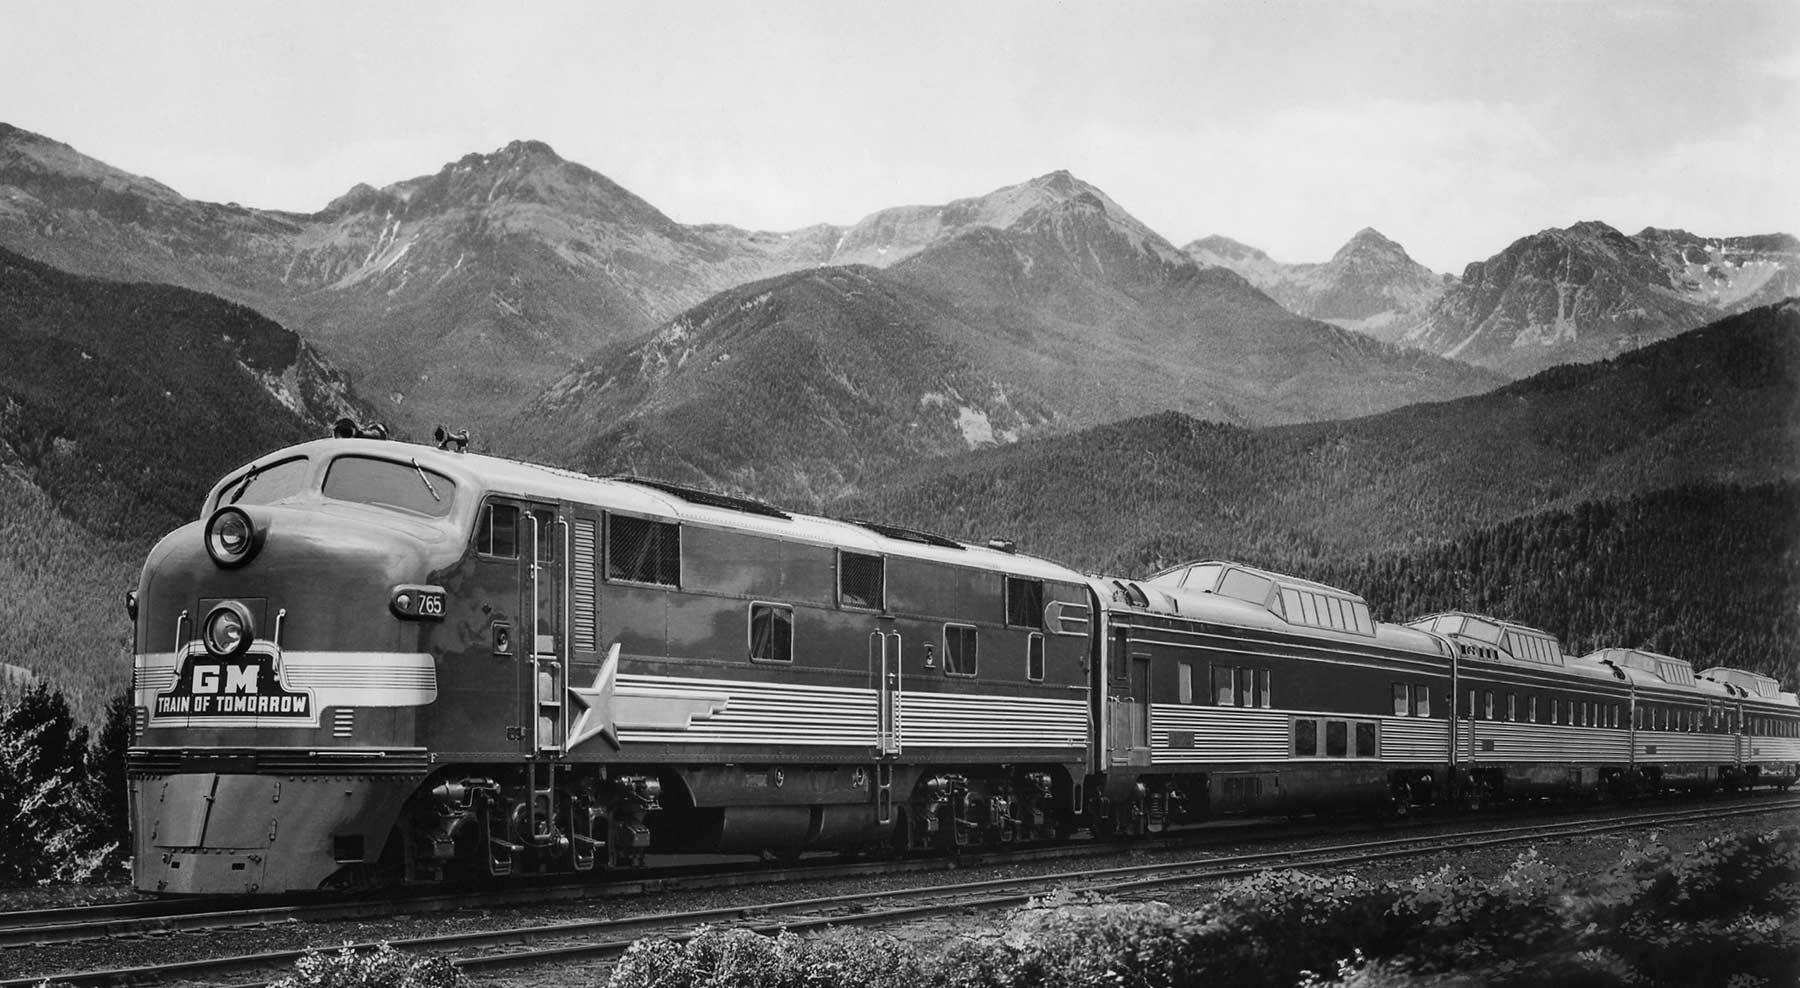 Gm Train Of Tomorrow Consist Locomotive X on Morgan Motors